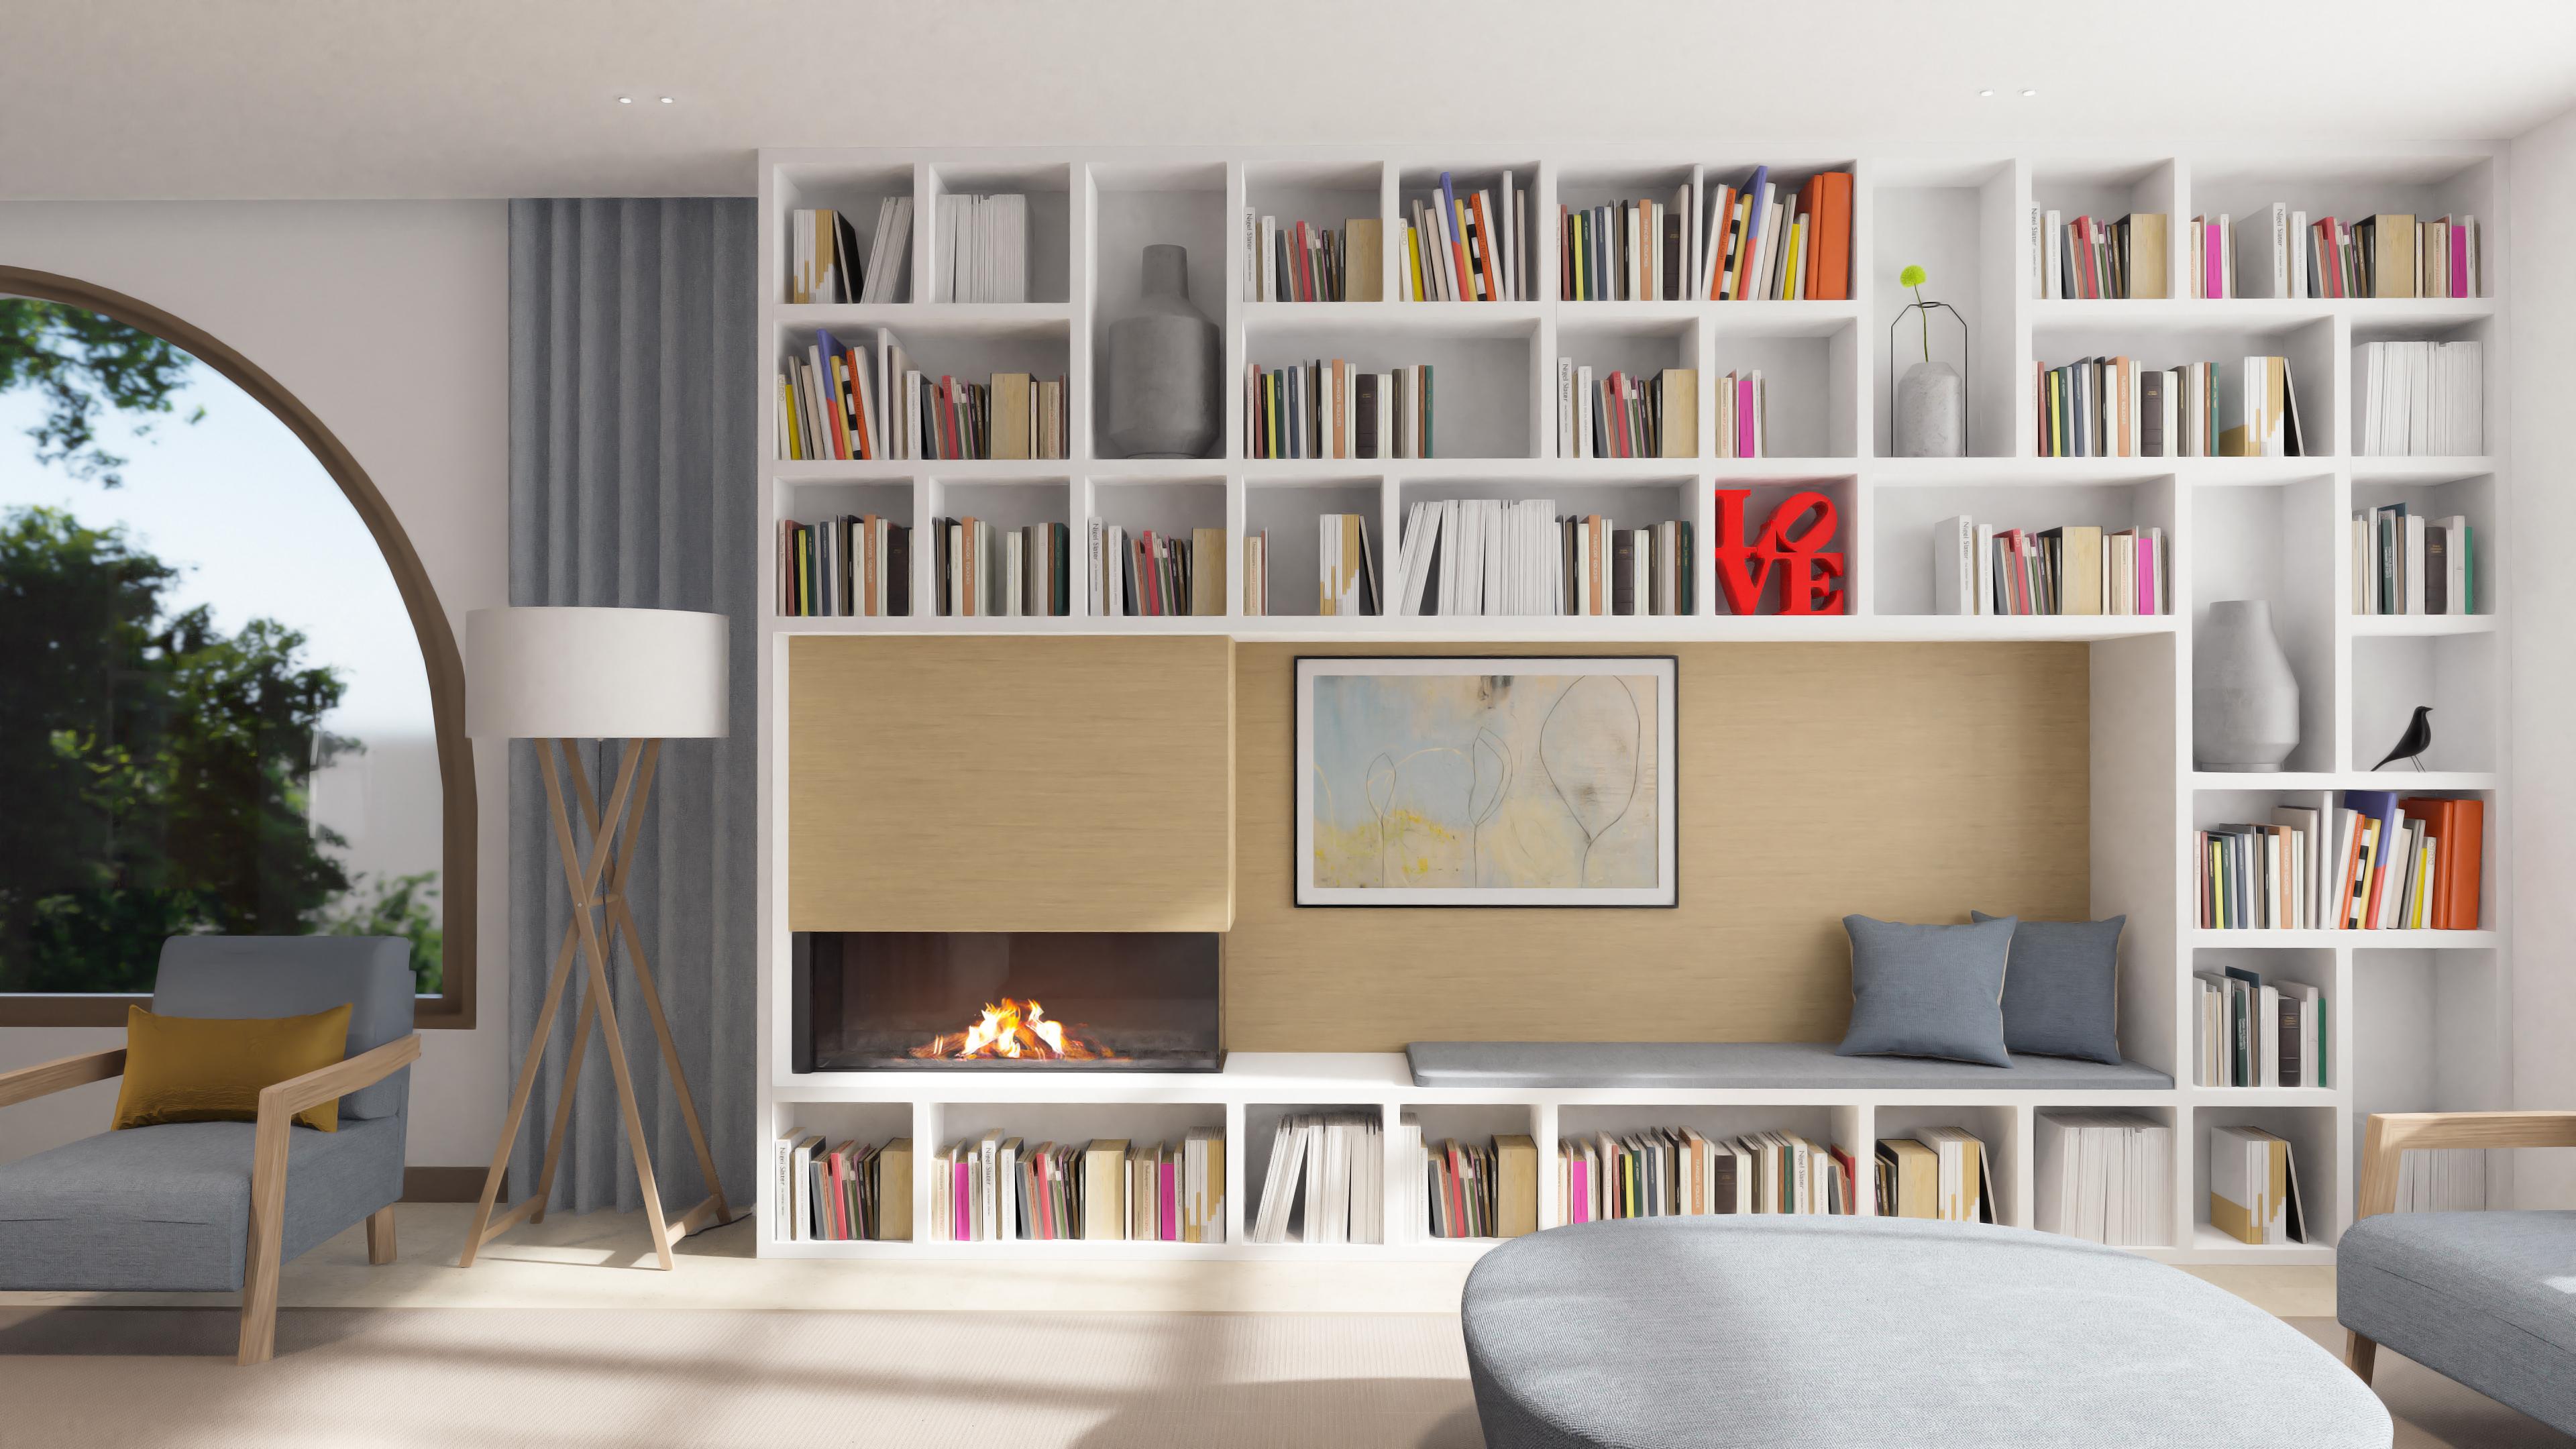 rardo-architects-new-hotel-project-sitges-vilanova-barcleona-garraf-coast-22